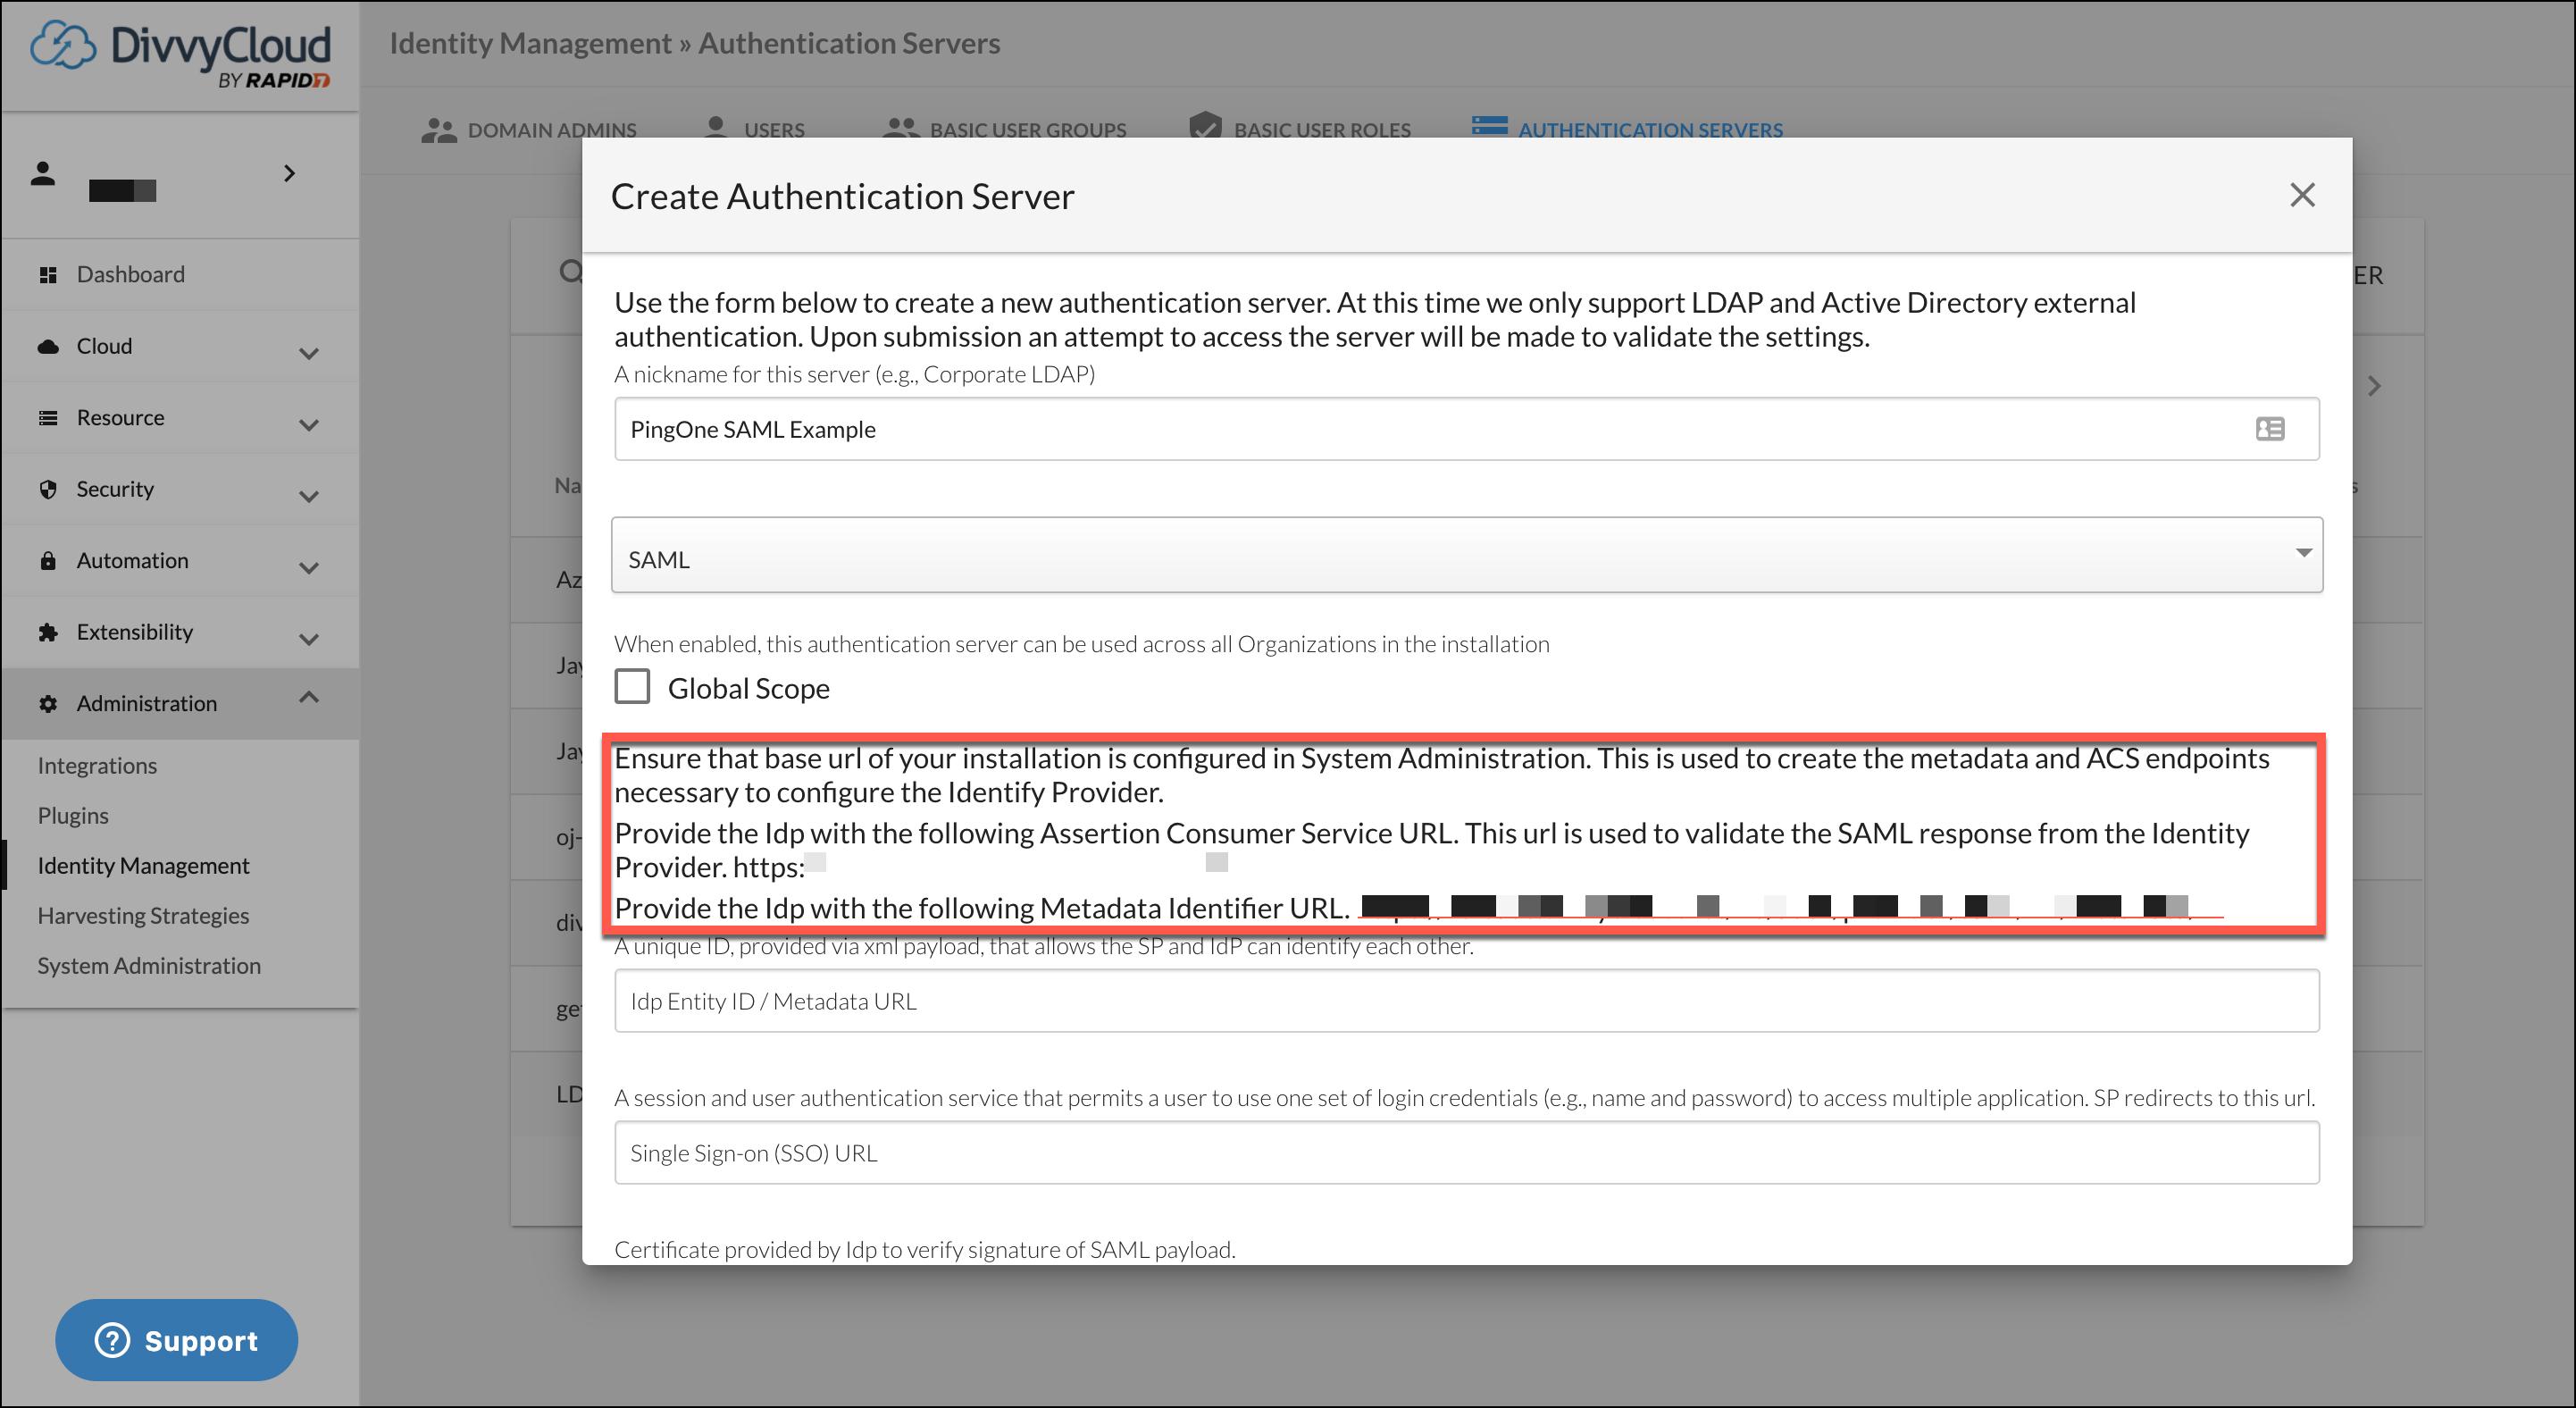 Add Authentication Server - PingOne SAML Example